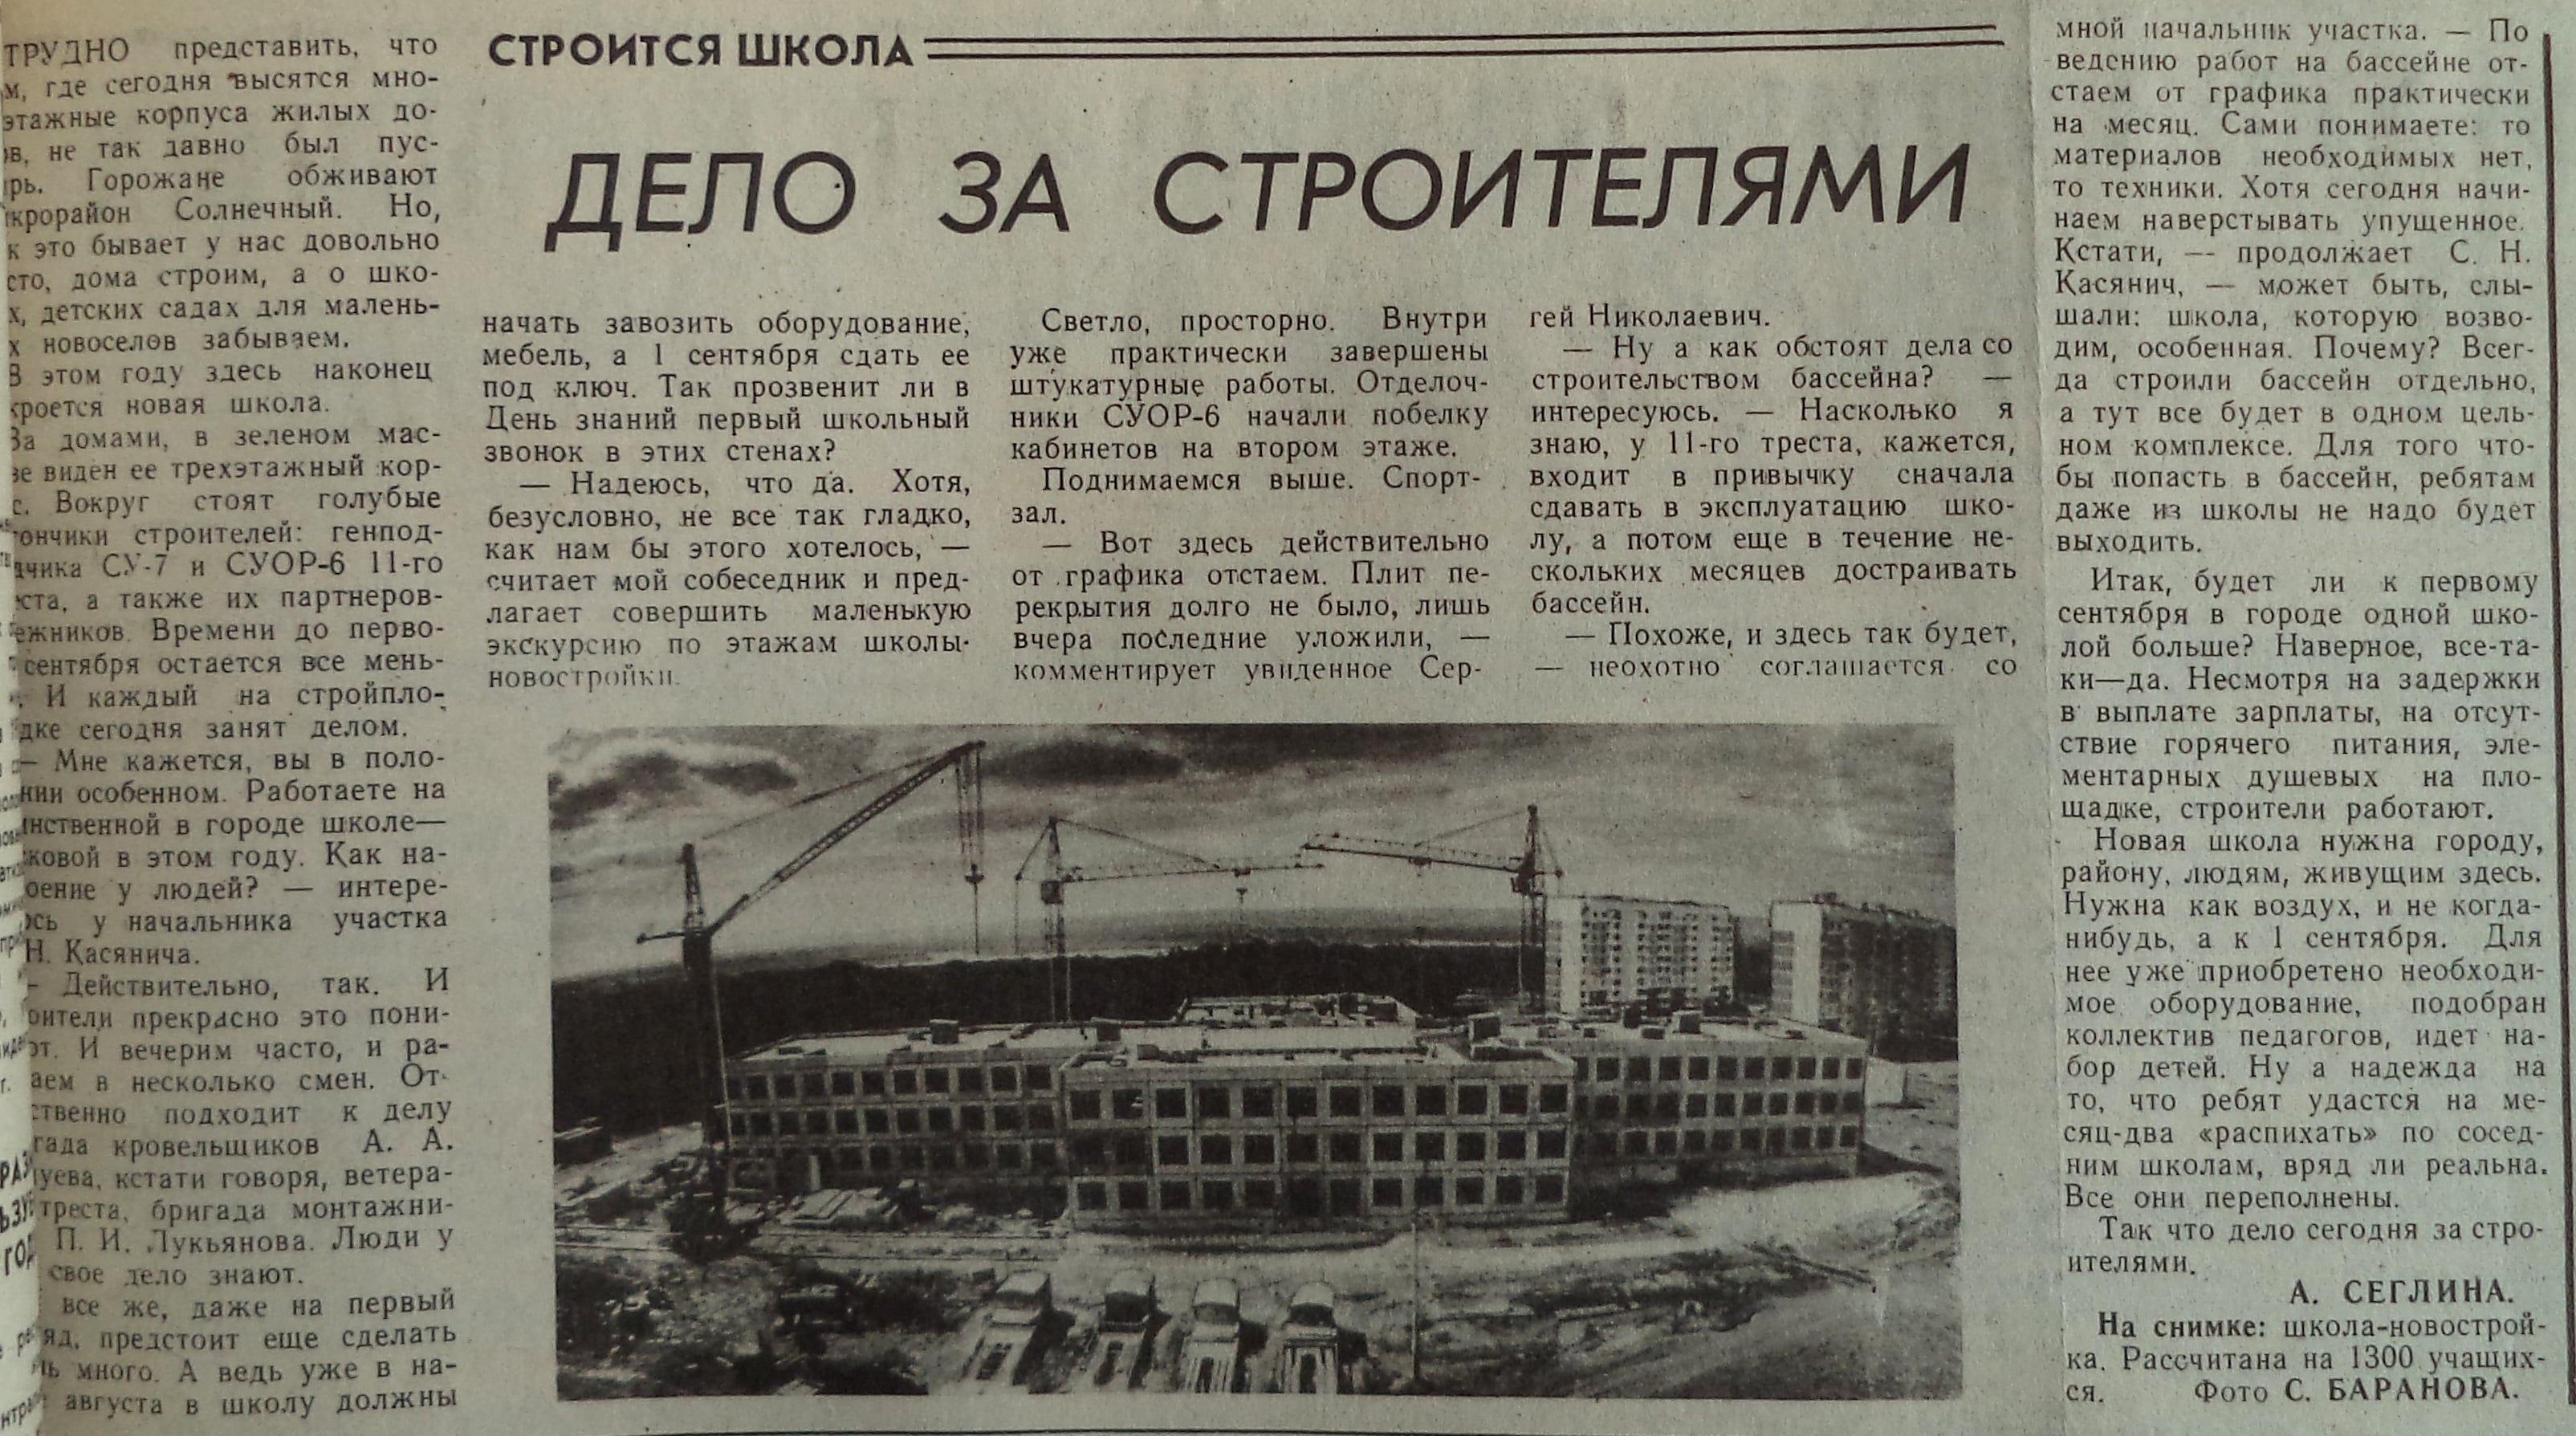 Солнечная-ФОТО-30-ВЗя-1992-07-23-стр-во школы № 154-min